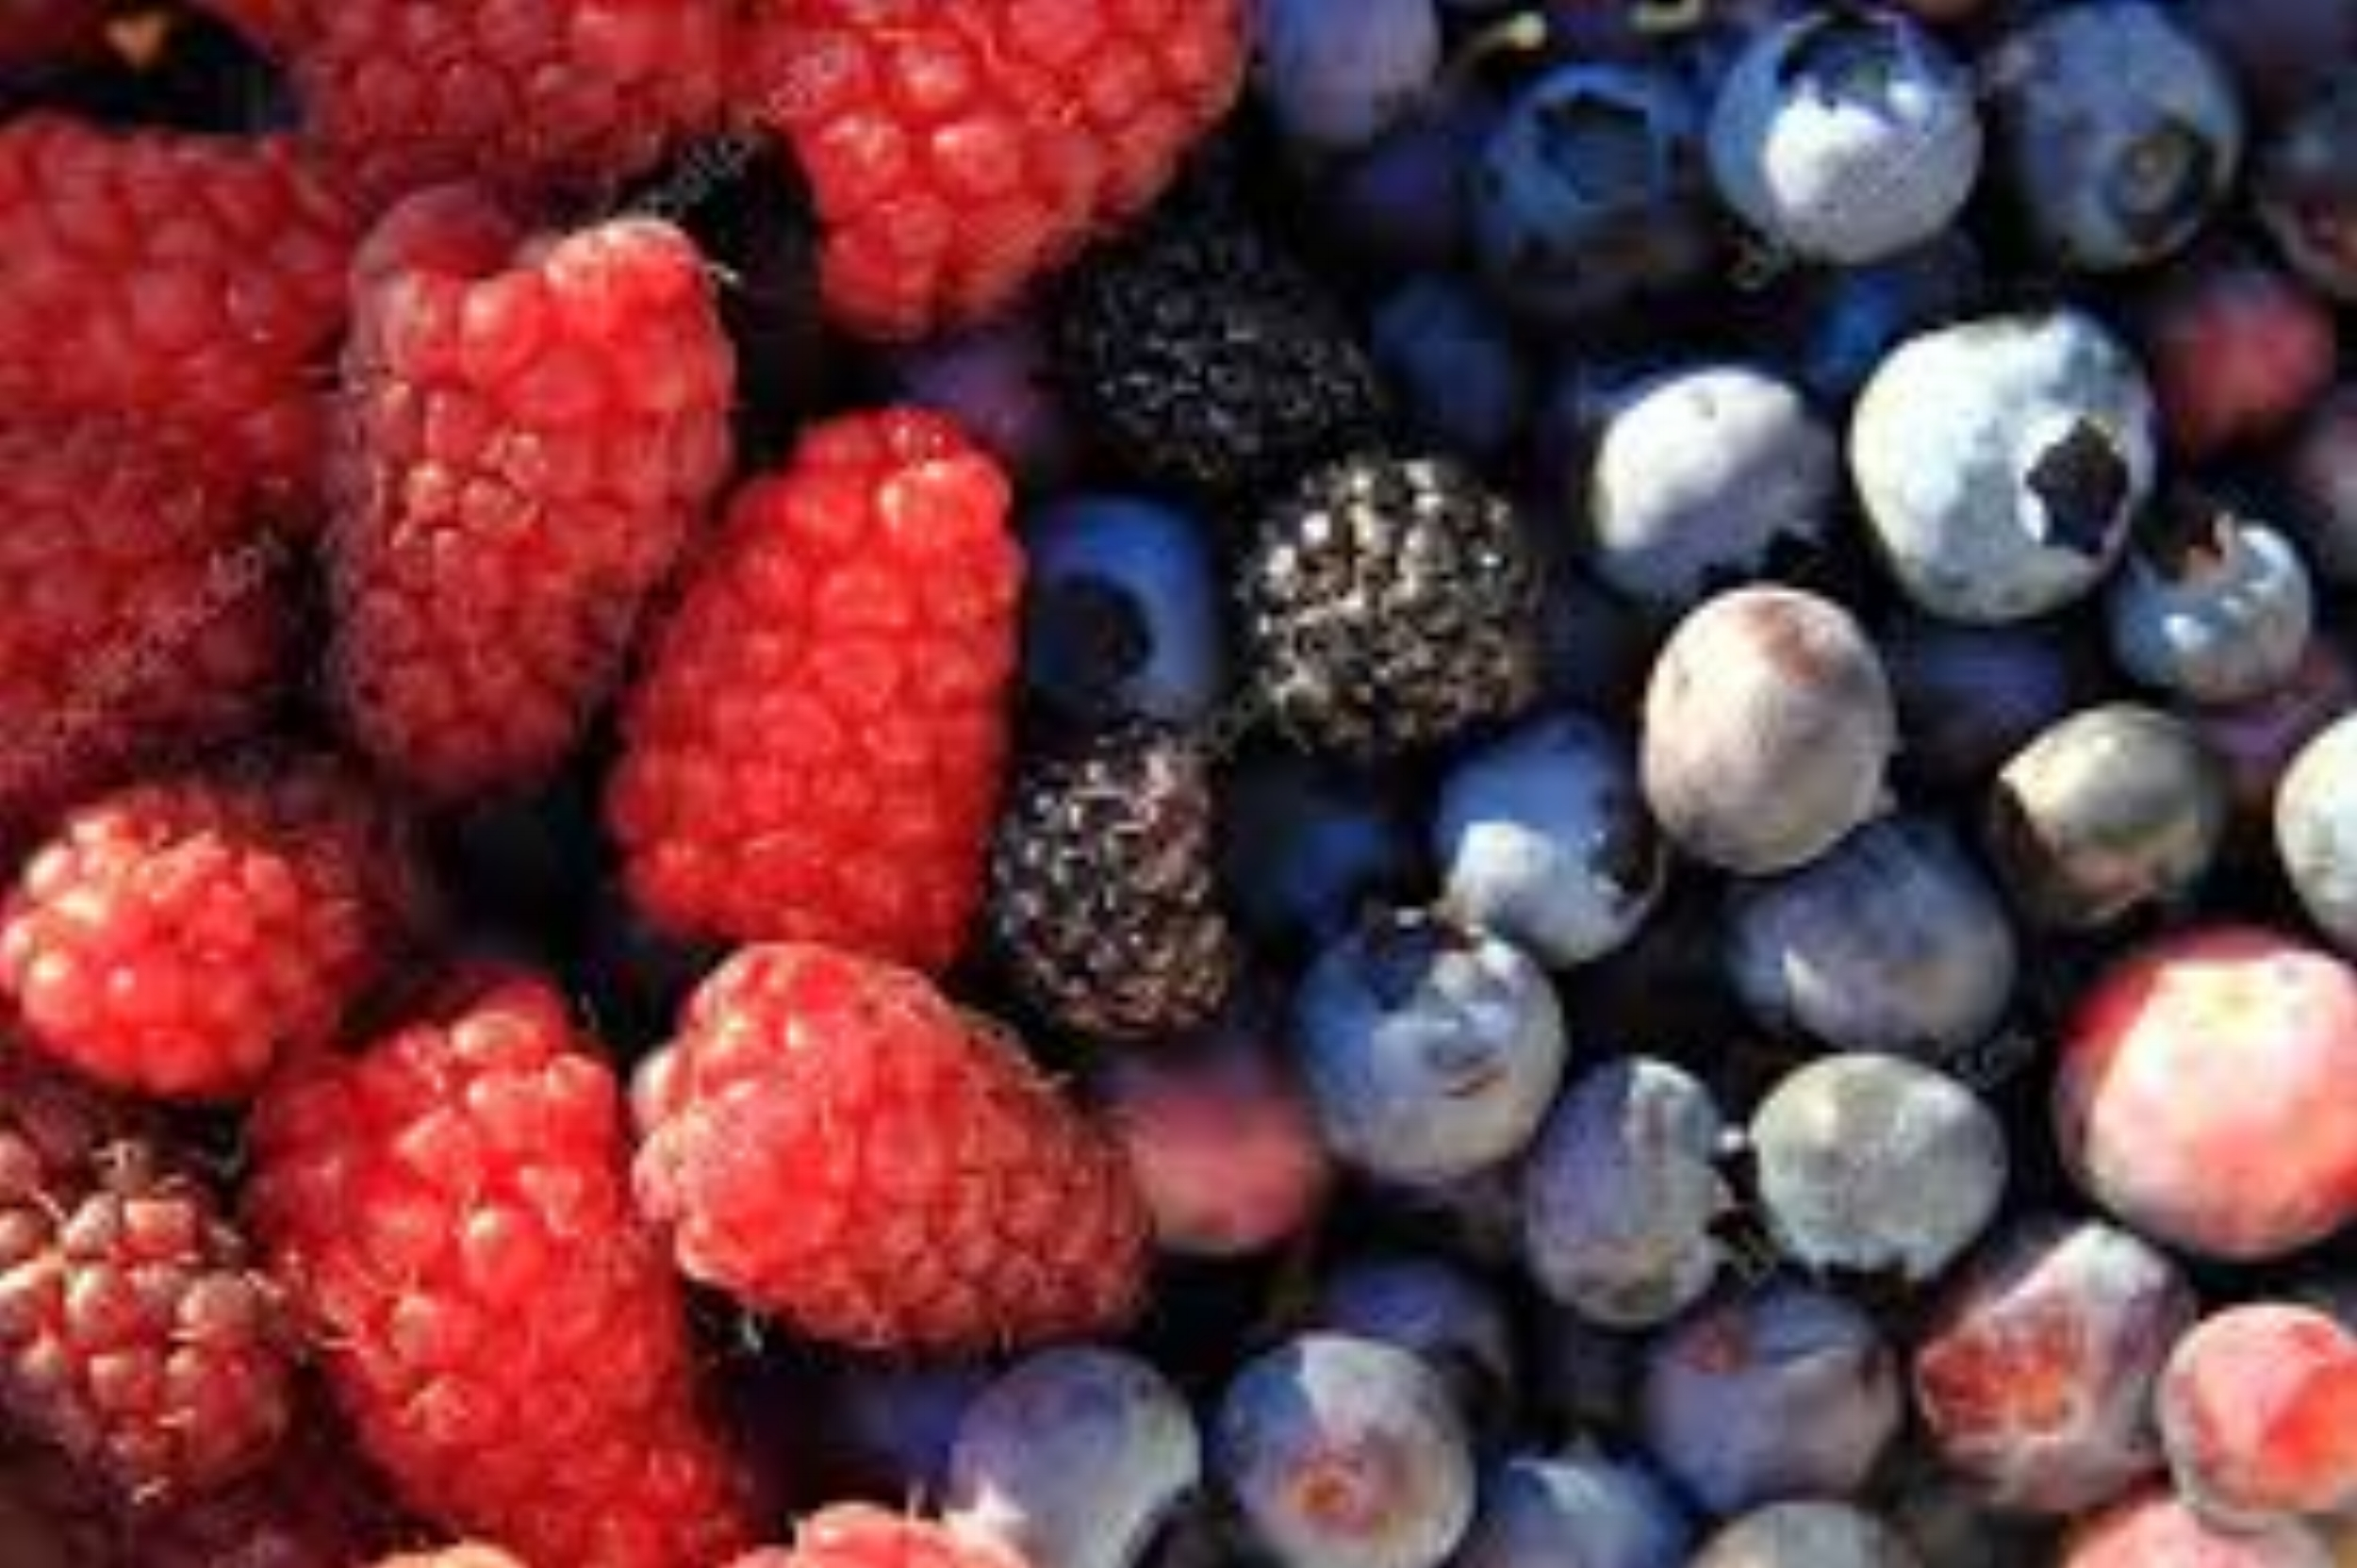 blueberry and raspberry.jpg